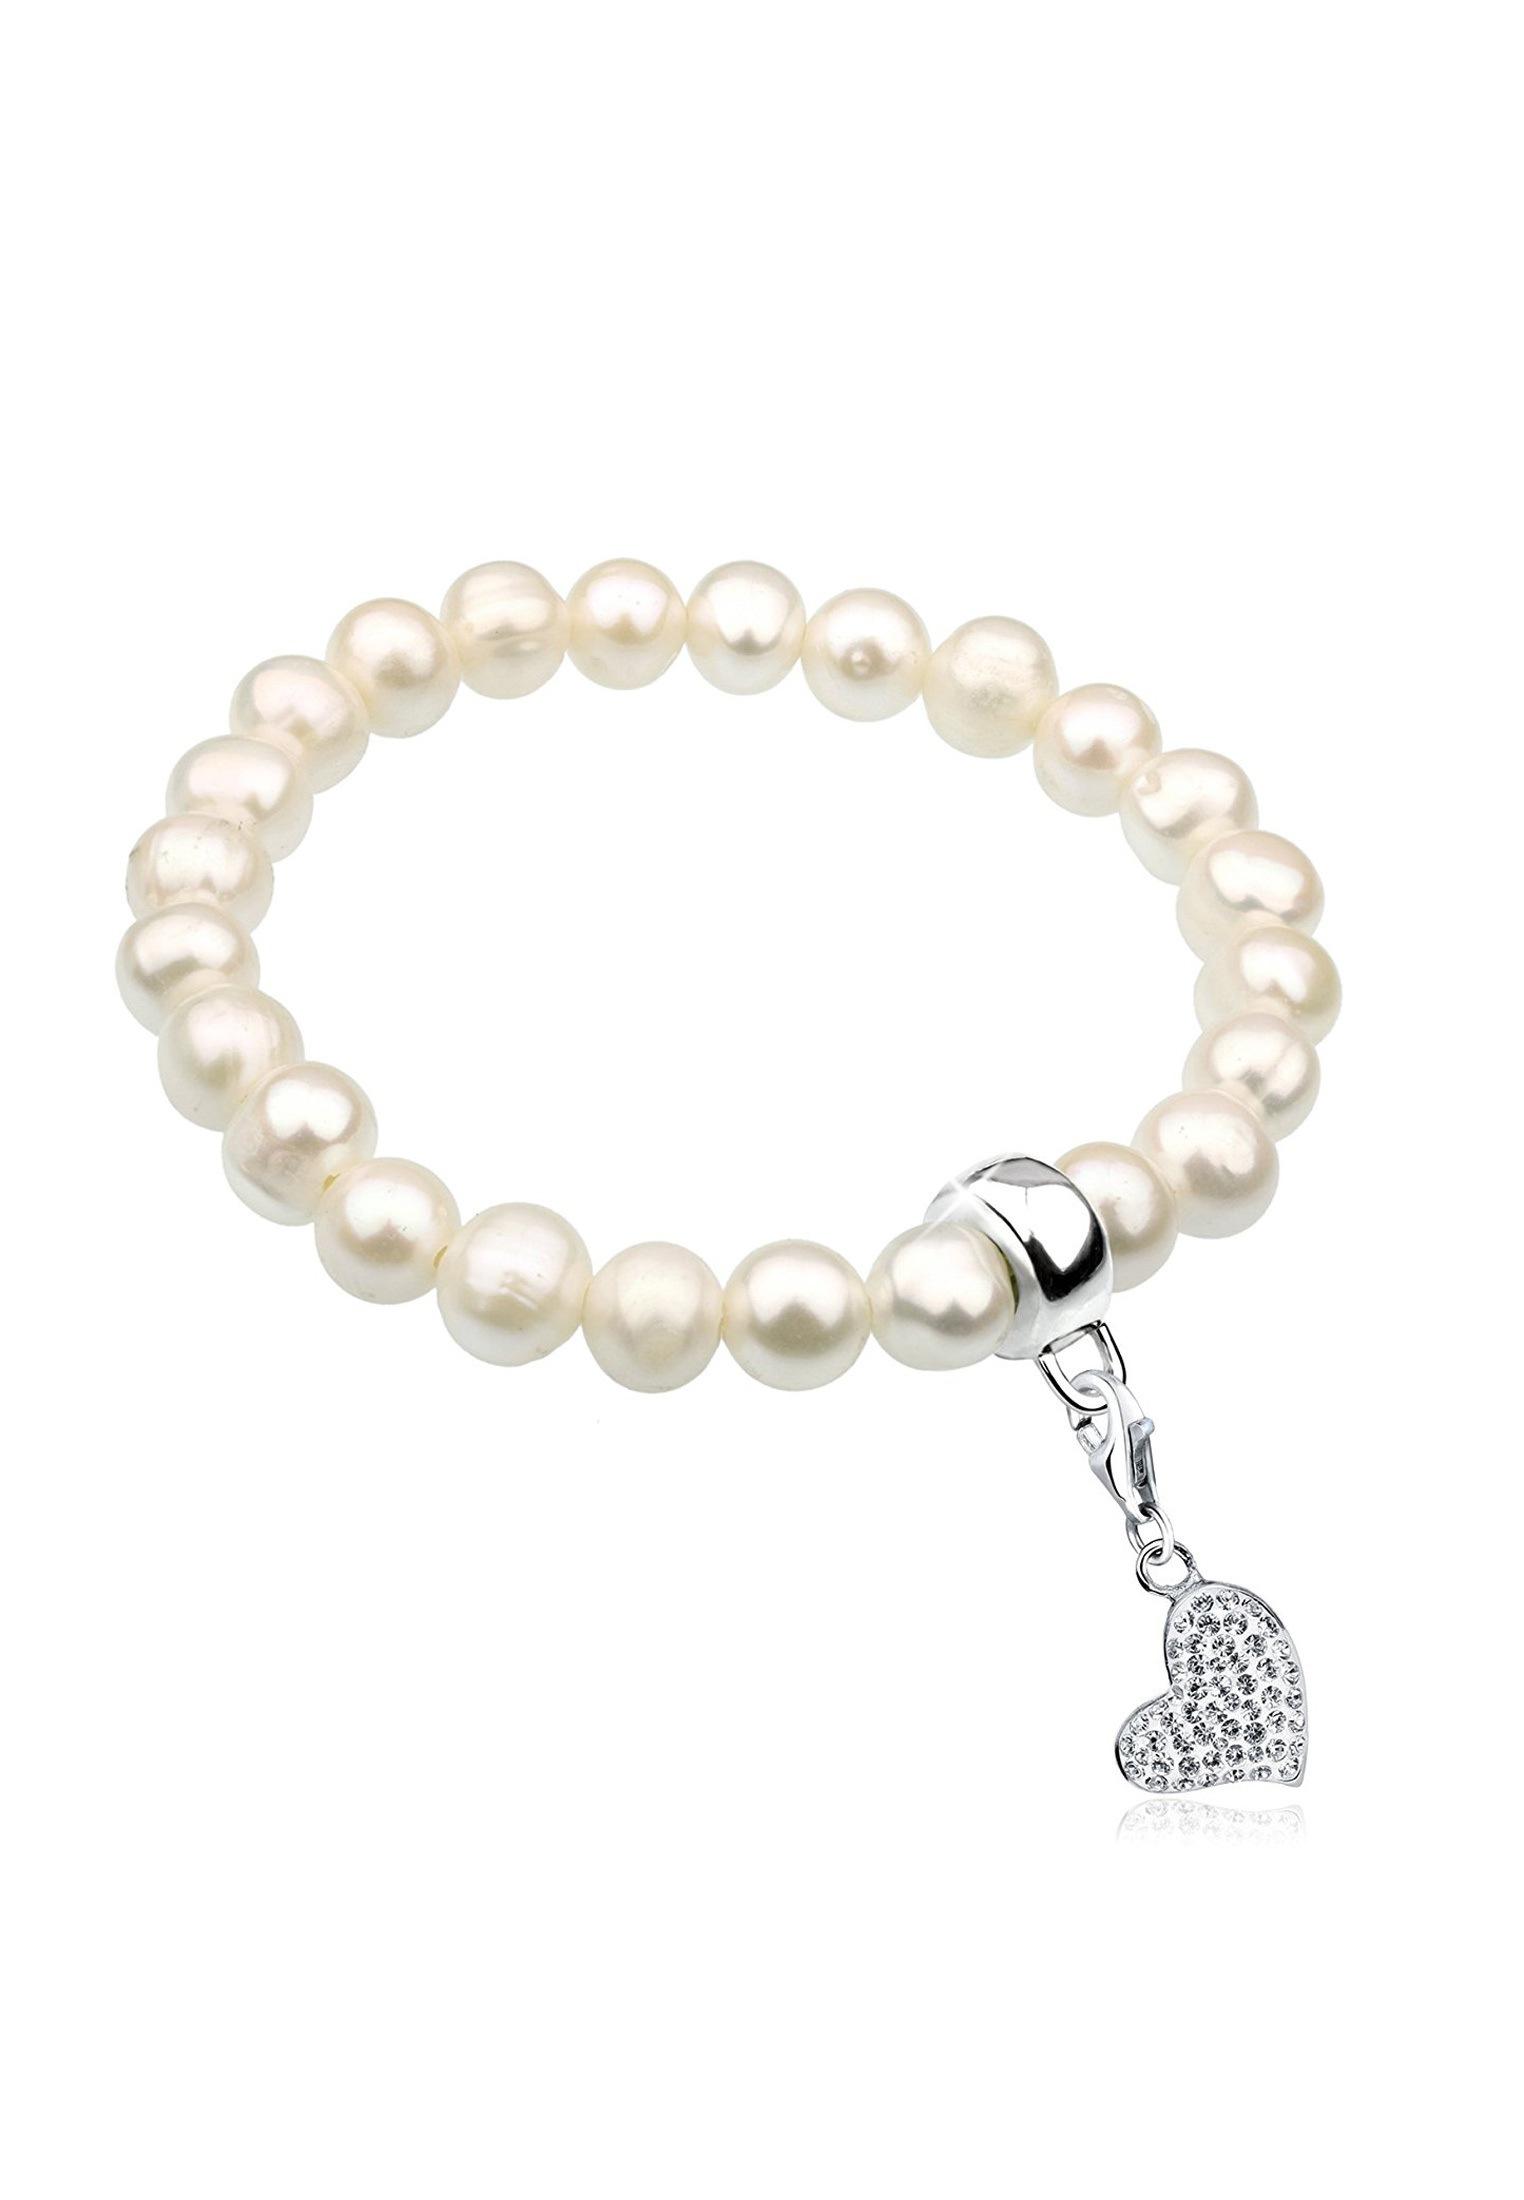 Nenalina Perlenarmband Perlen mit Herz Symbol aus Swarovski Kristalle | Schmuck > Armbänder > Perlenarmbänder | Nenalina